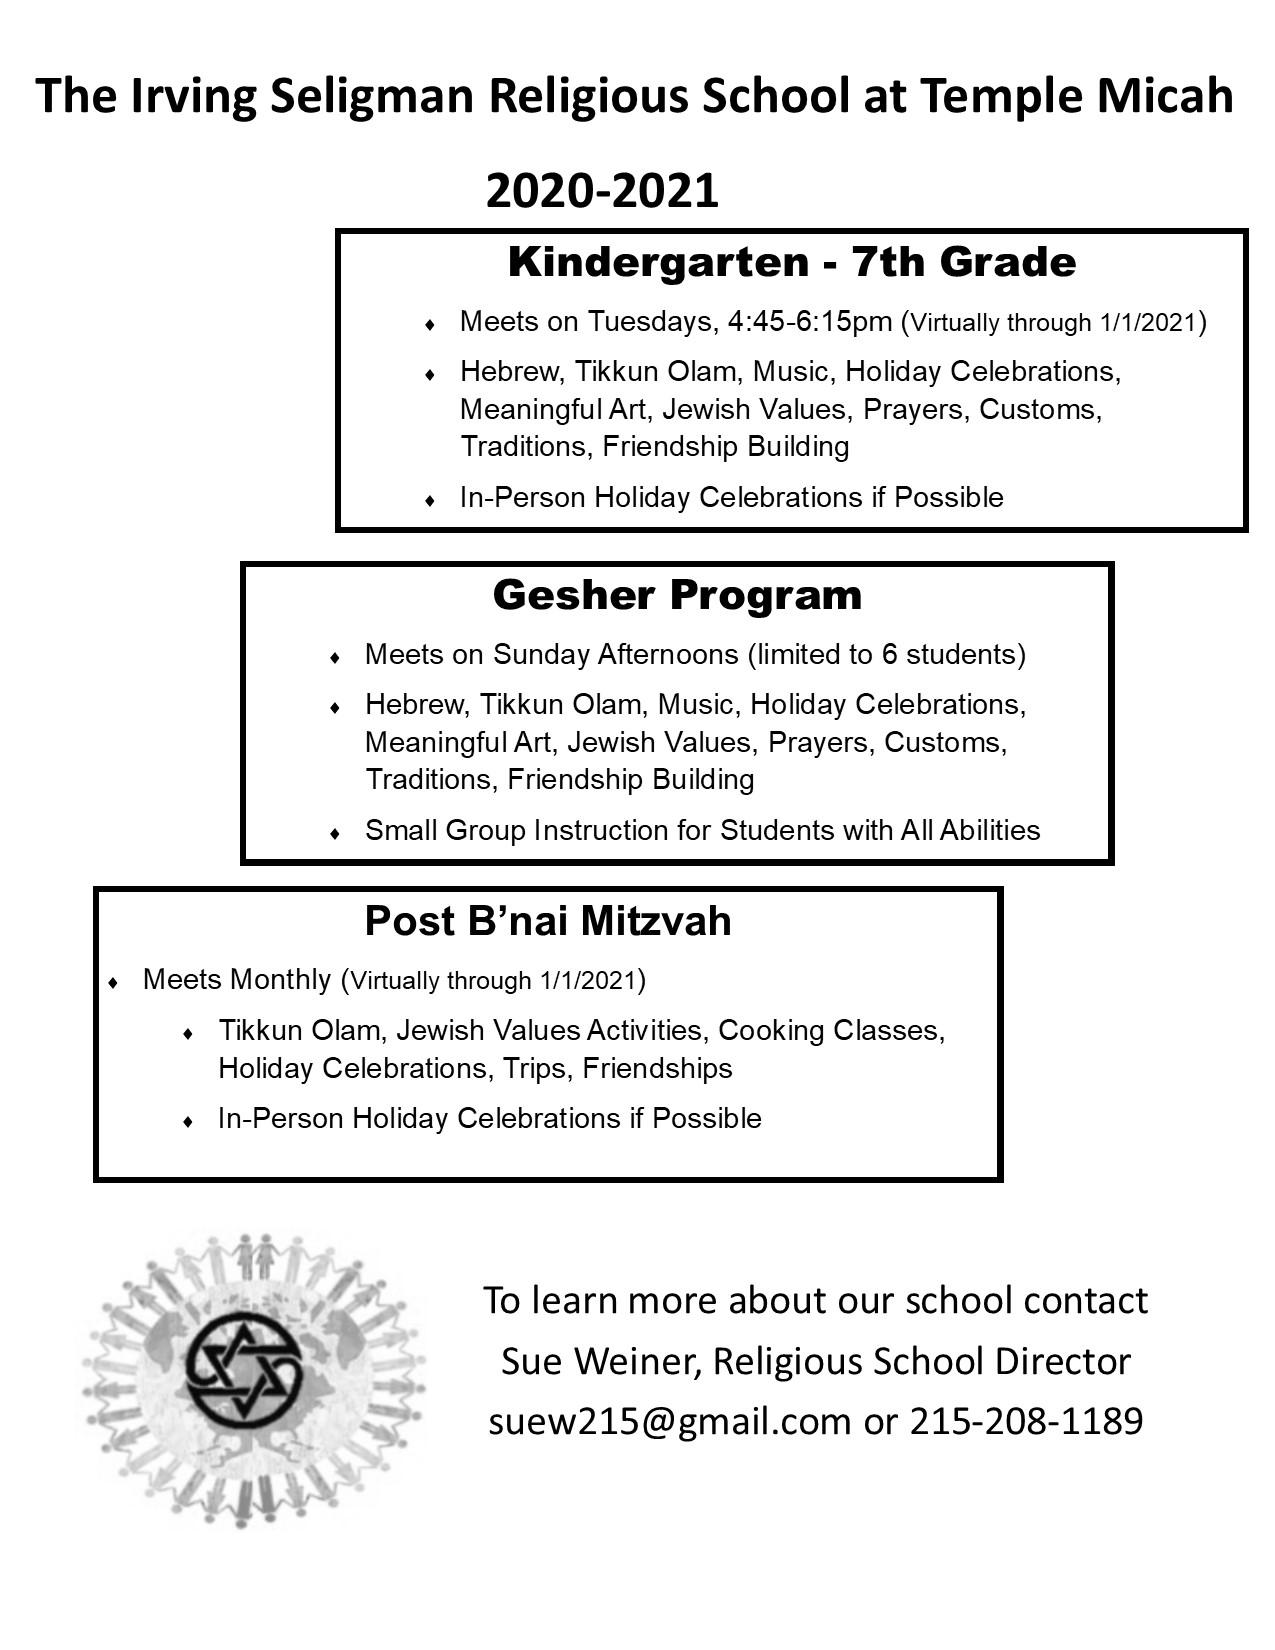 Temple Micah Religious School 2020